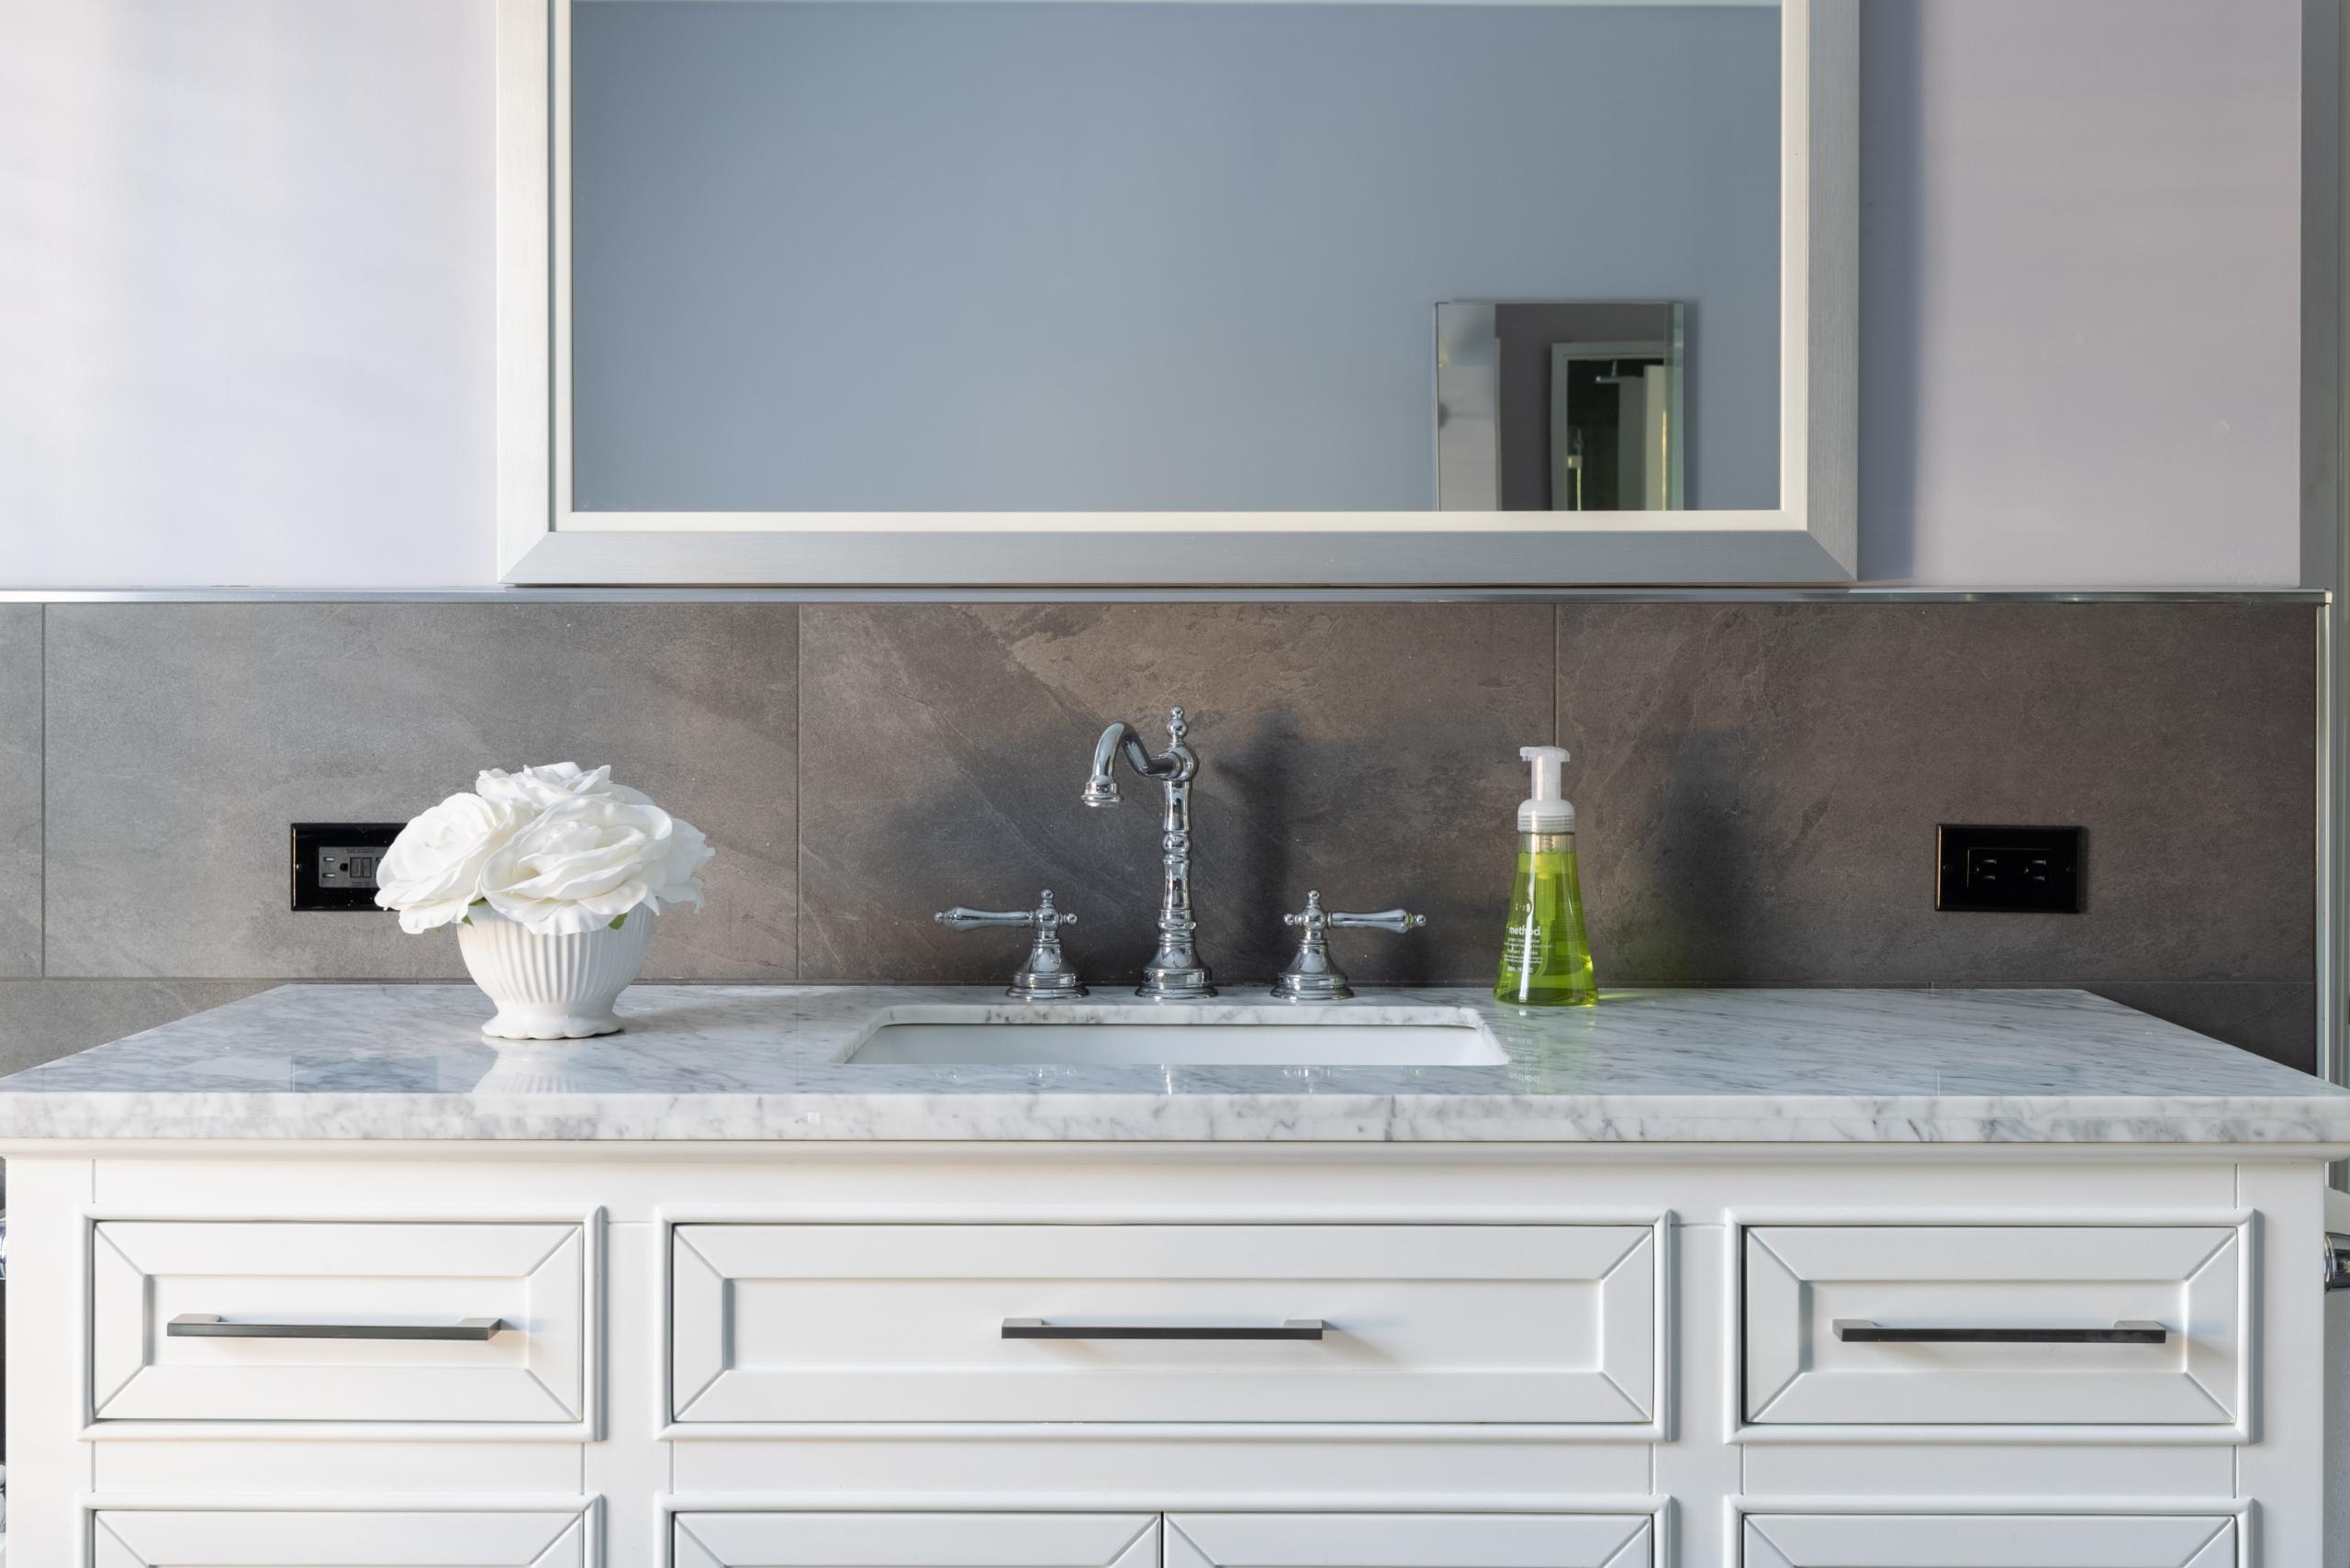 Bathroom featured at 349 Trafalgar Road, Old Oakville, ON at Alex Irish & Associates